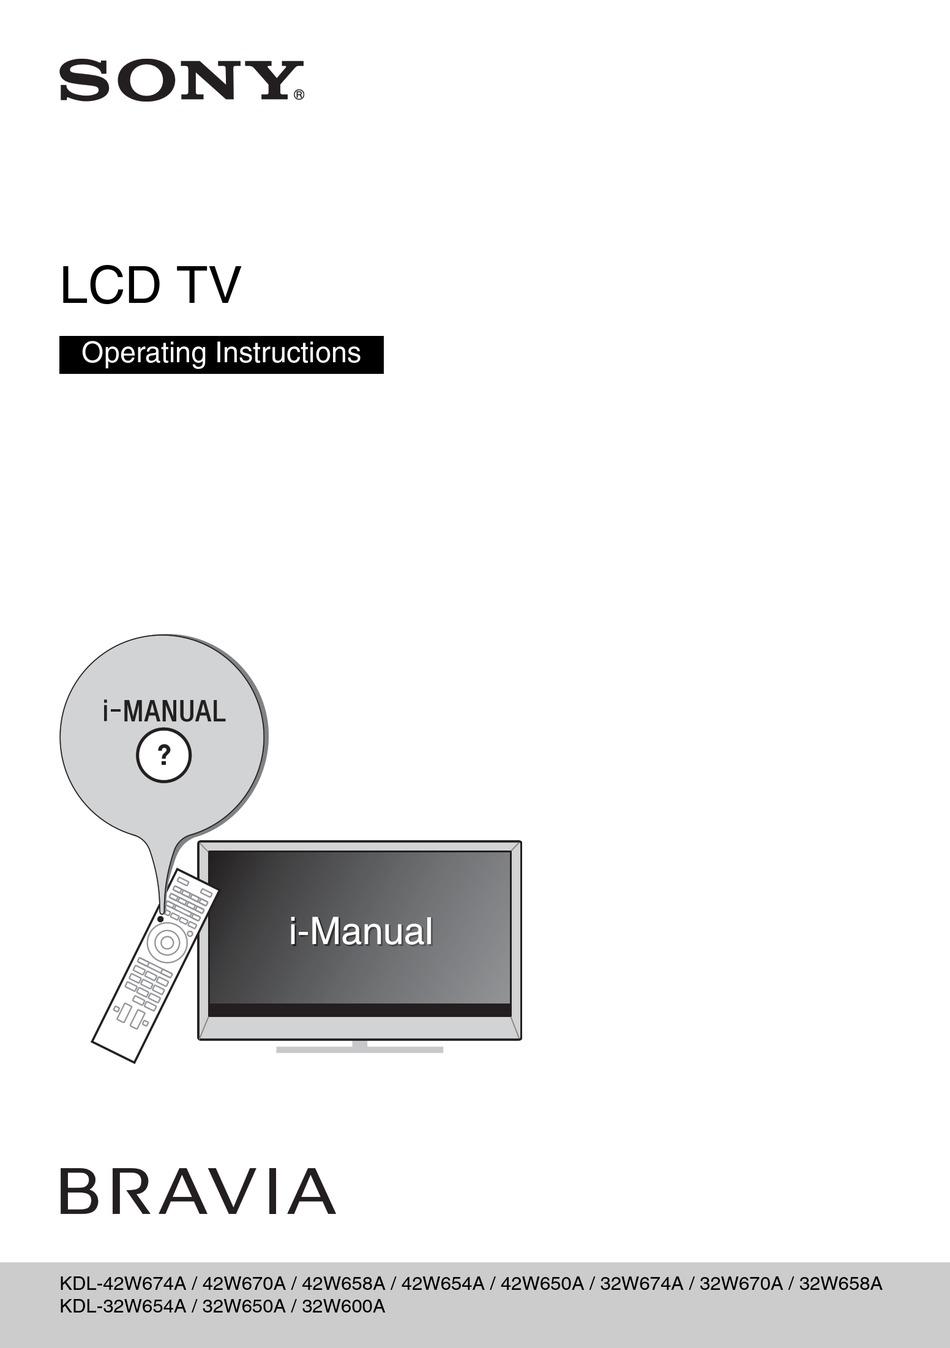 Sony Bravia Kdl 42w674a Operating Instructions Manual Pdf Download Manualslib